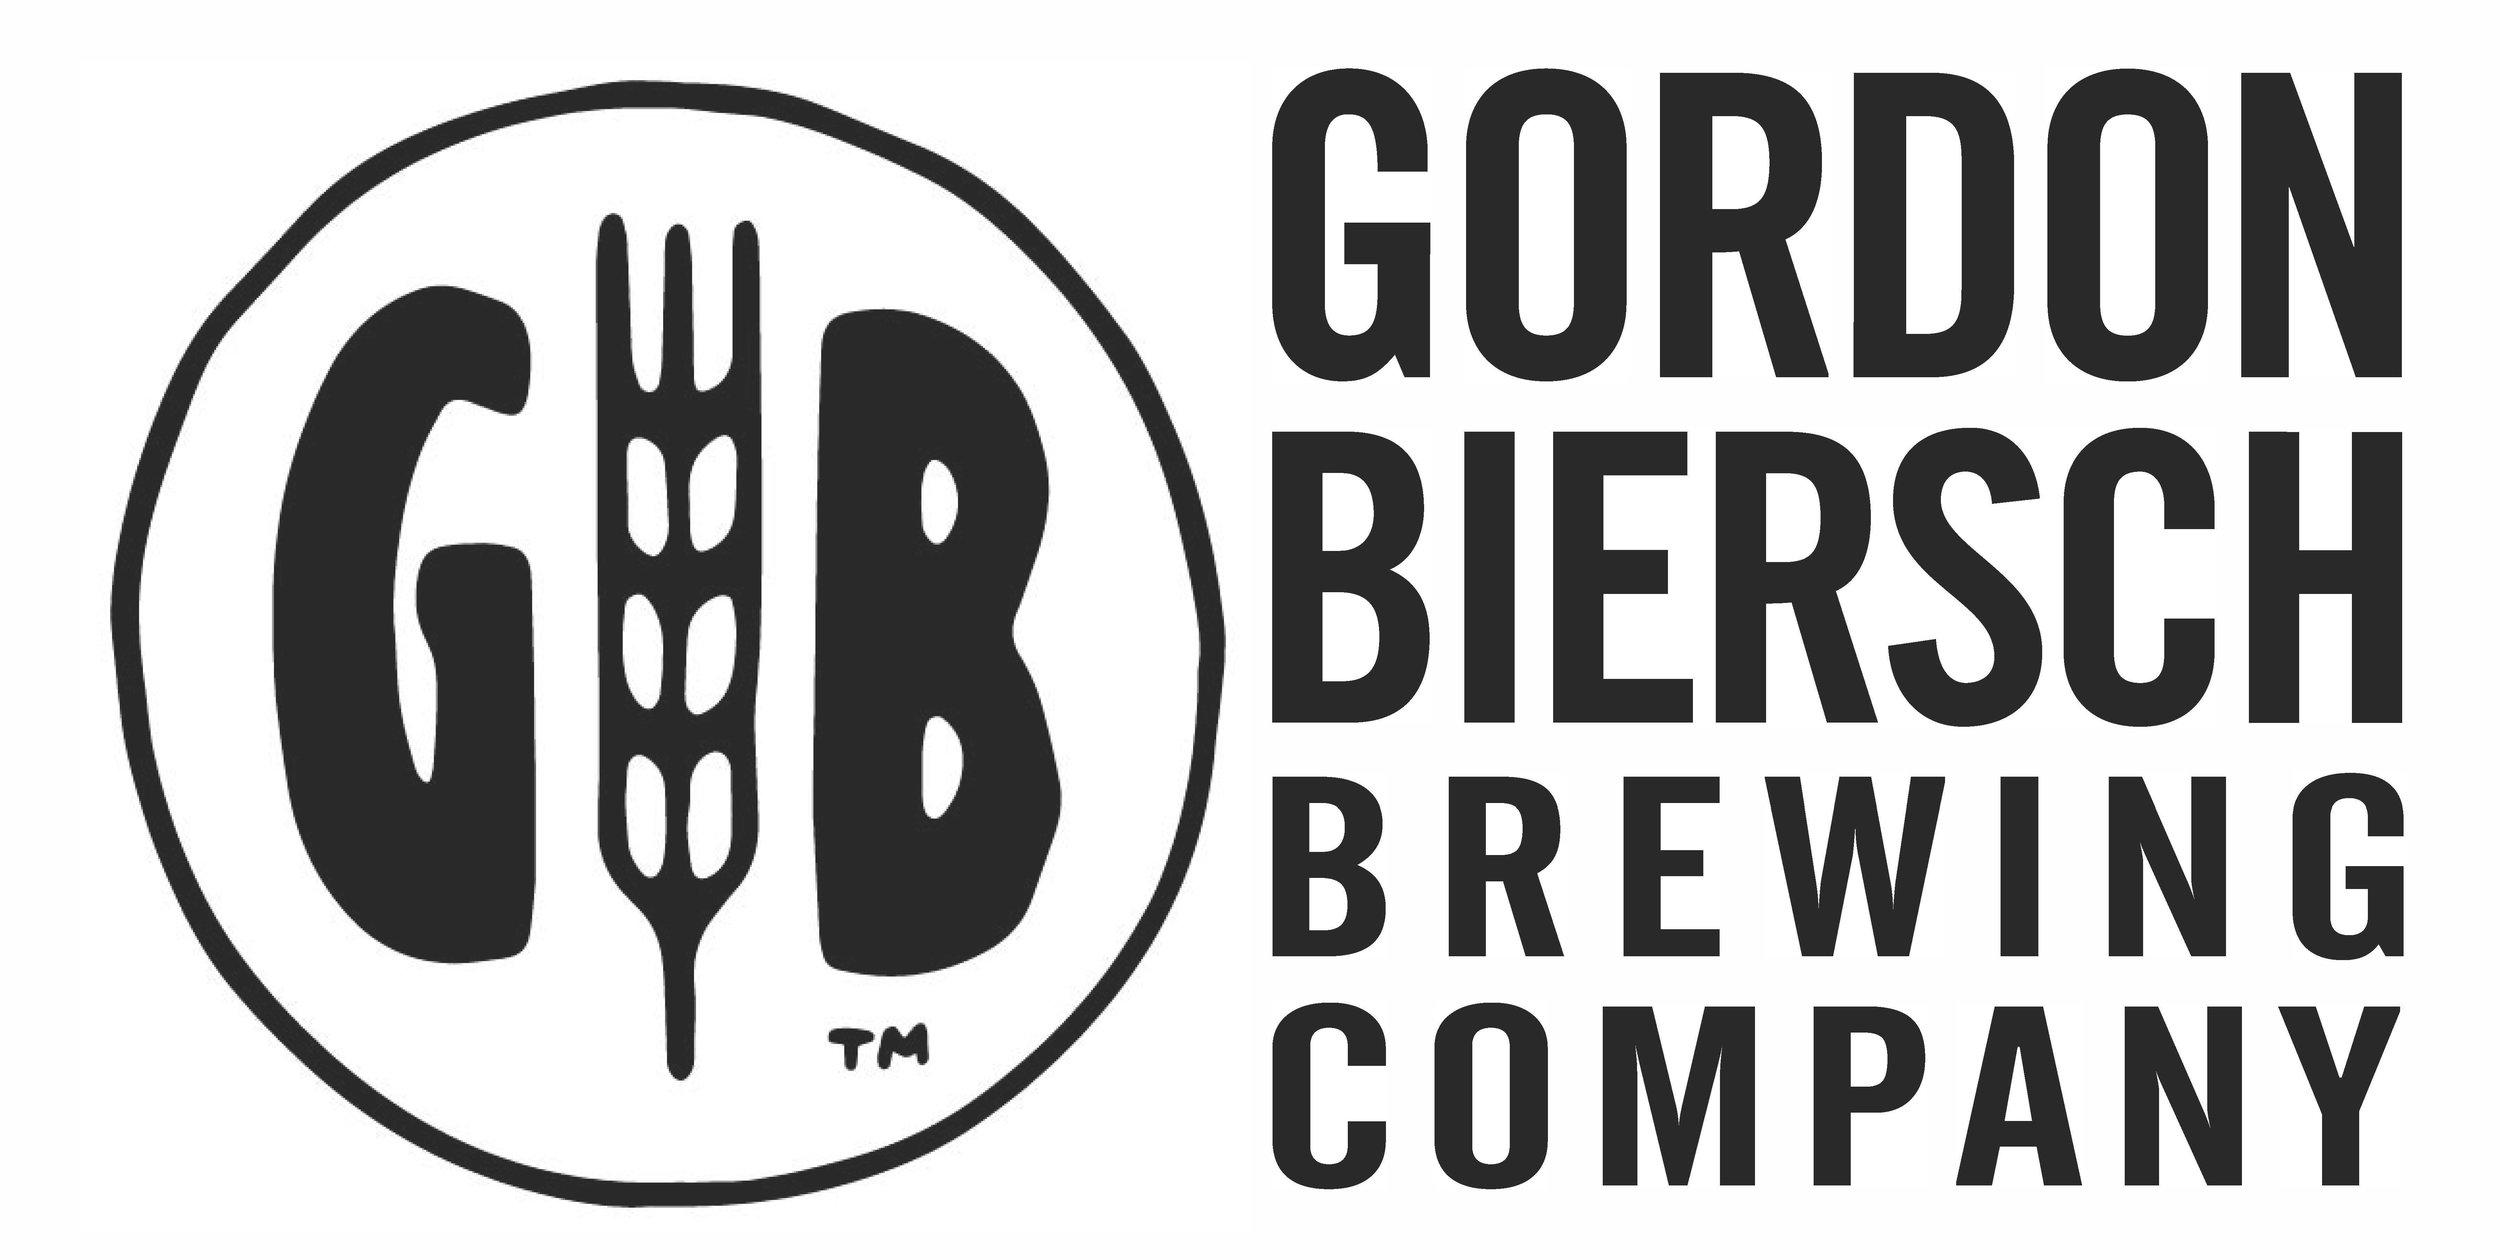 GB Emblem by GBBC Rebrand 1-color_Blk on White.jpg